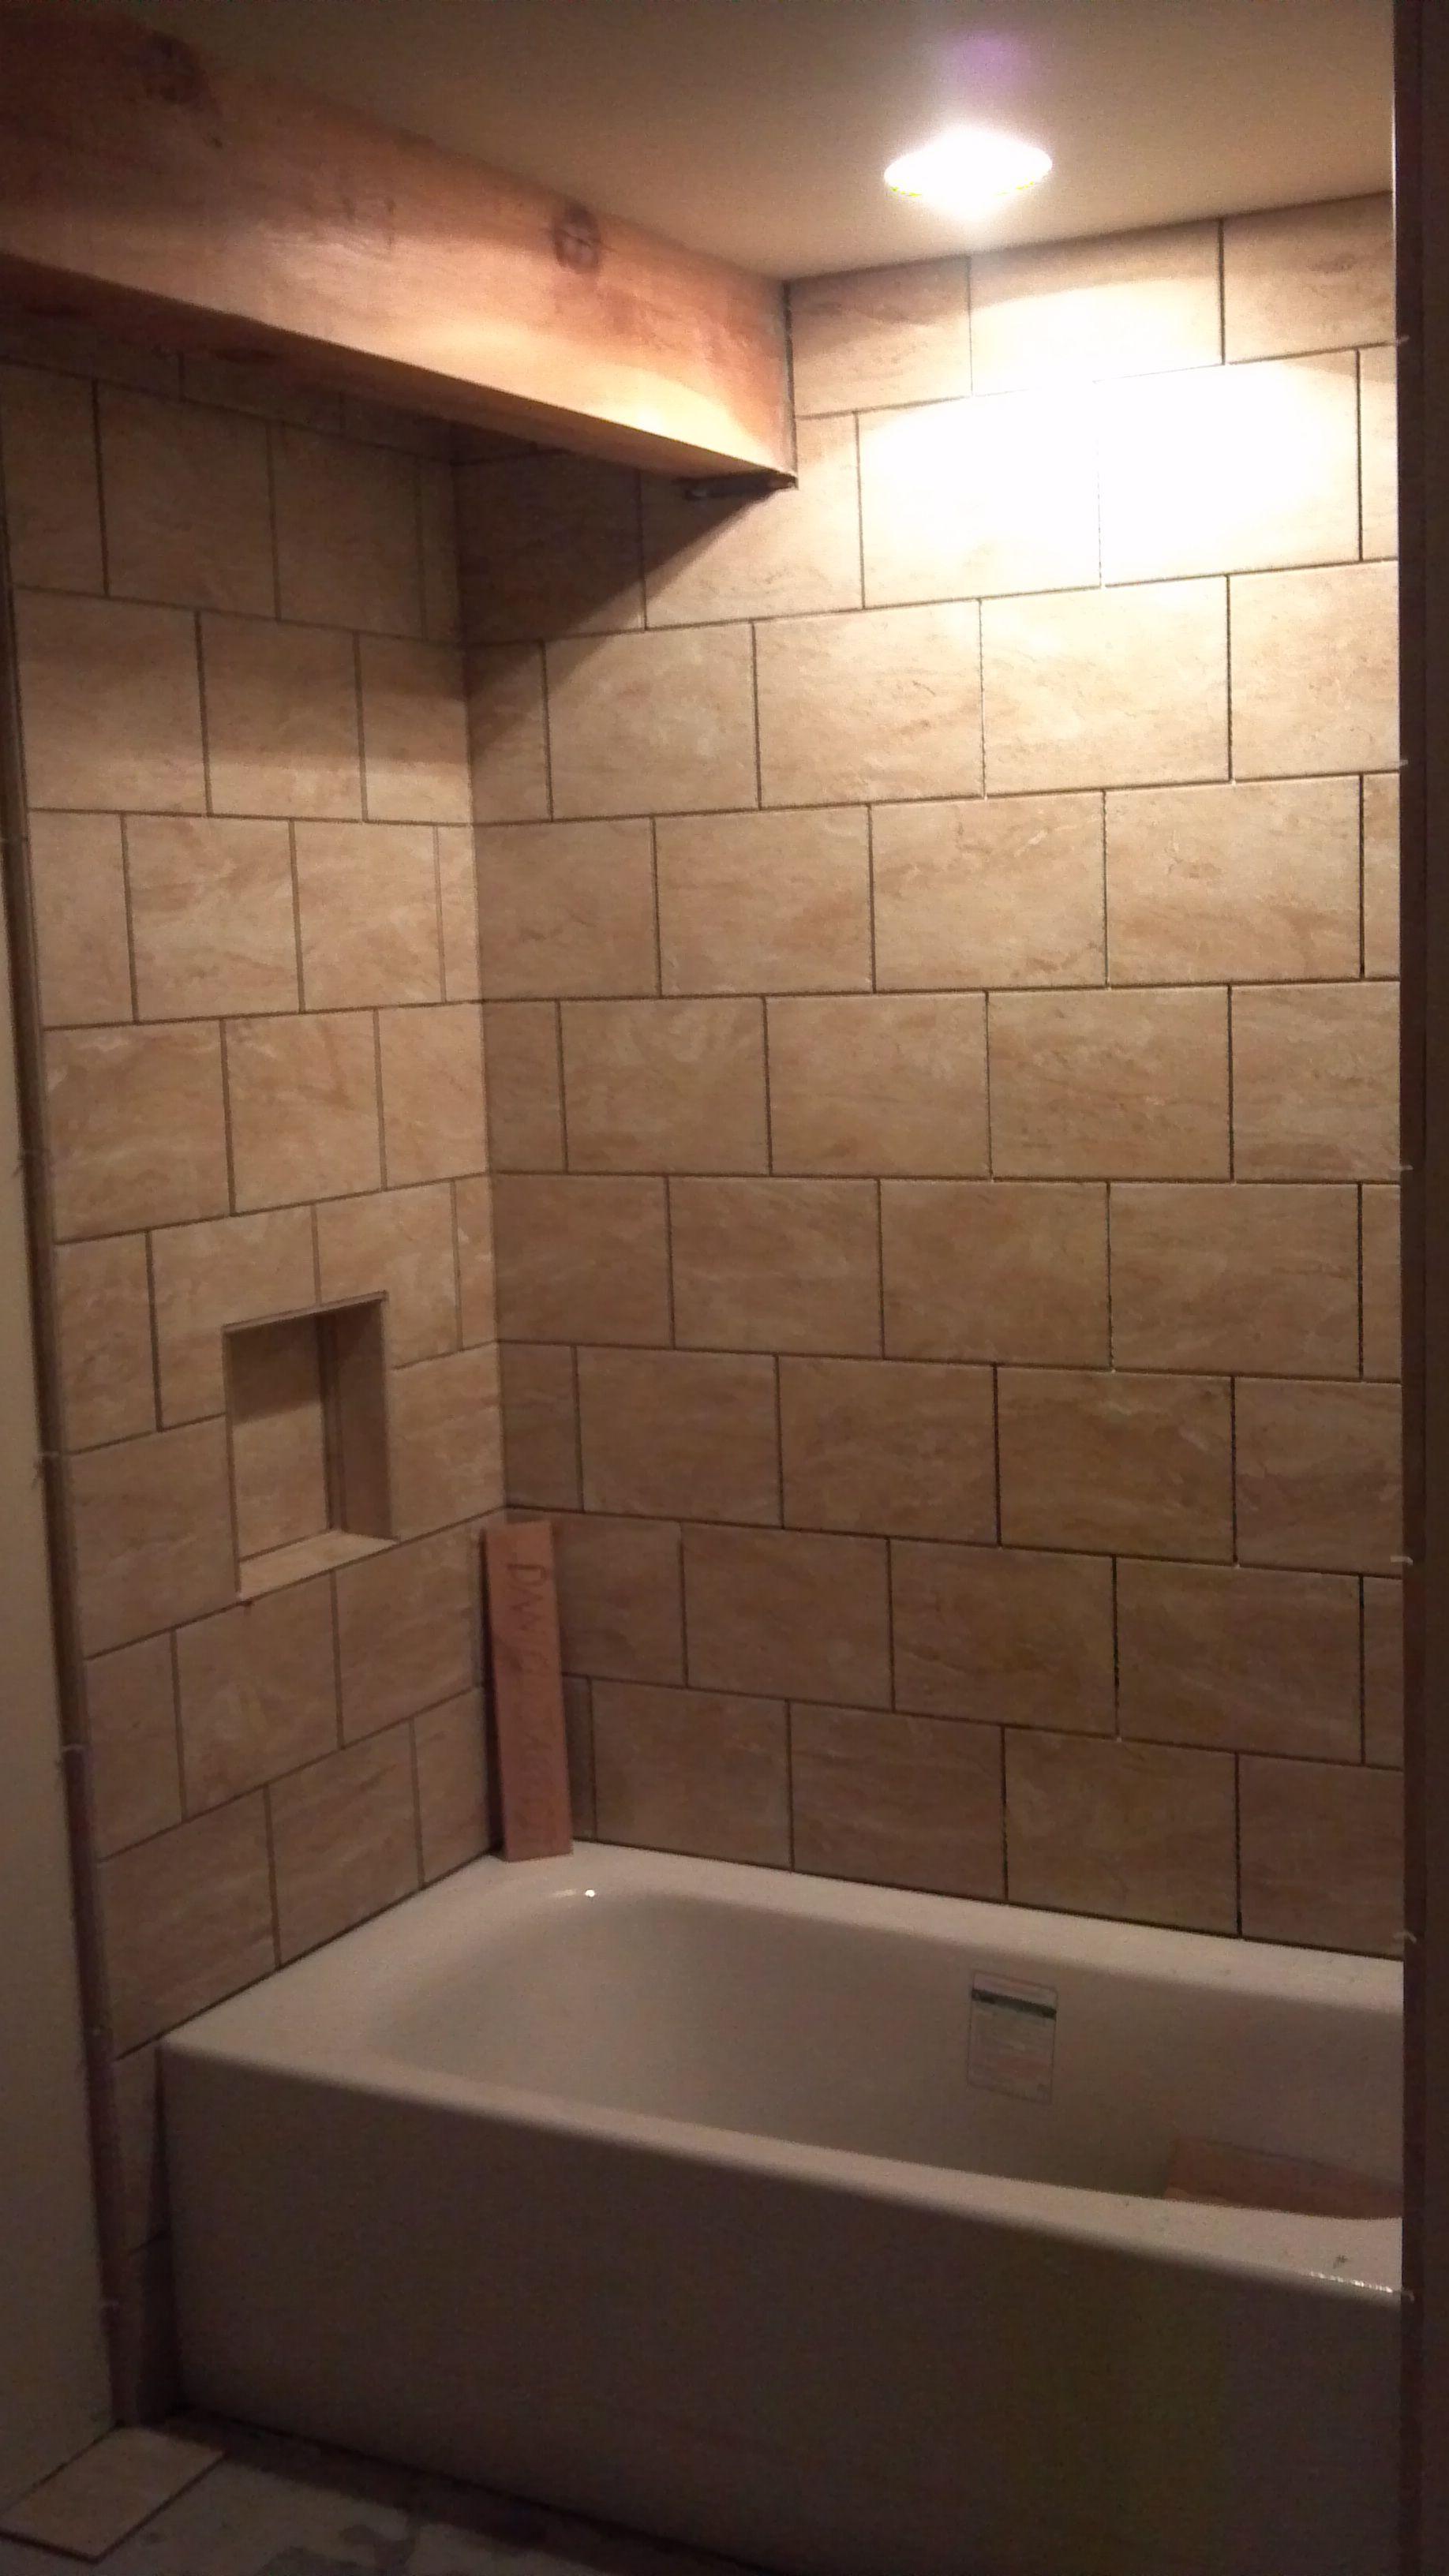 Ceramic tile tub-surround | Bathroom tubs & fixtures | Pinterest ...